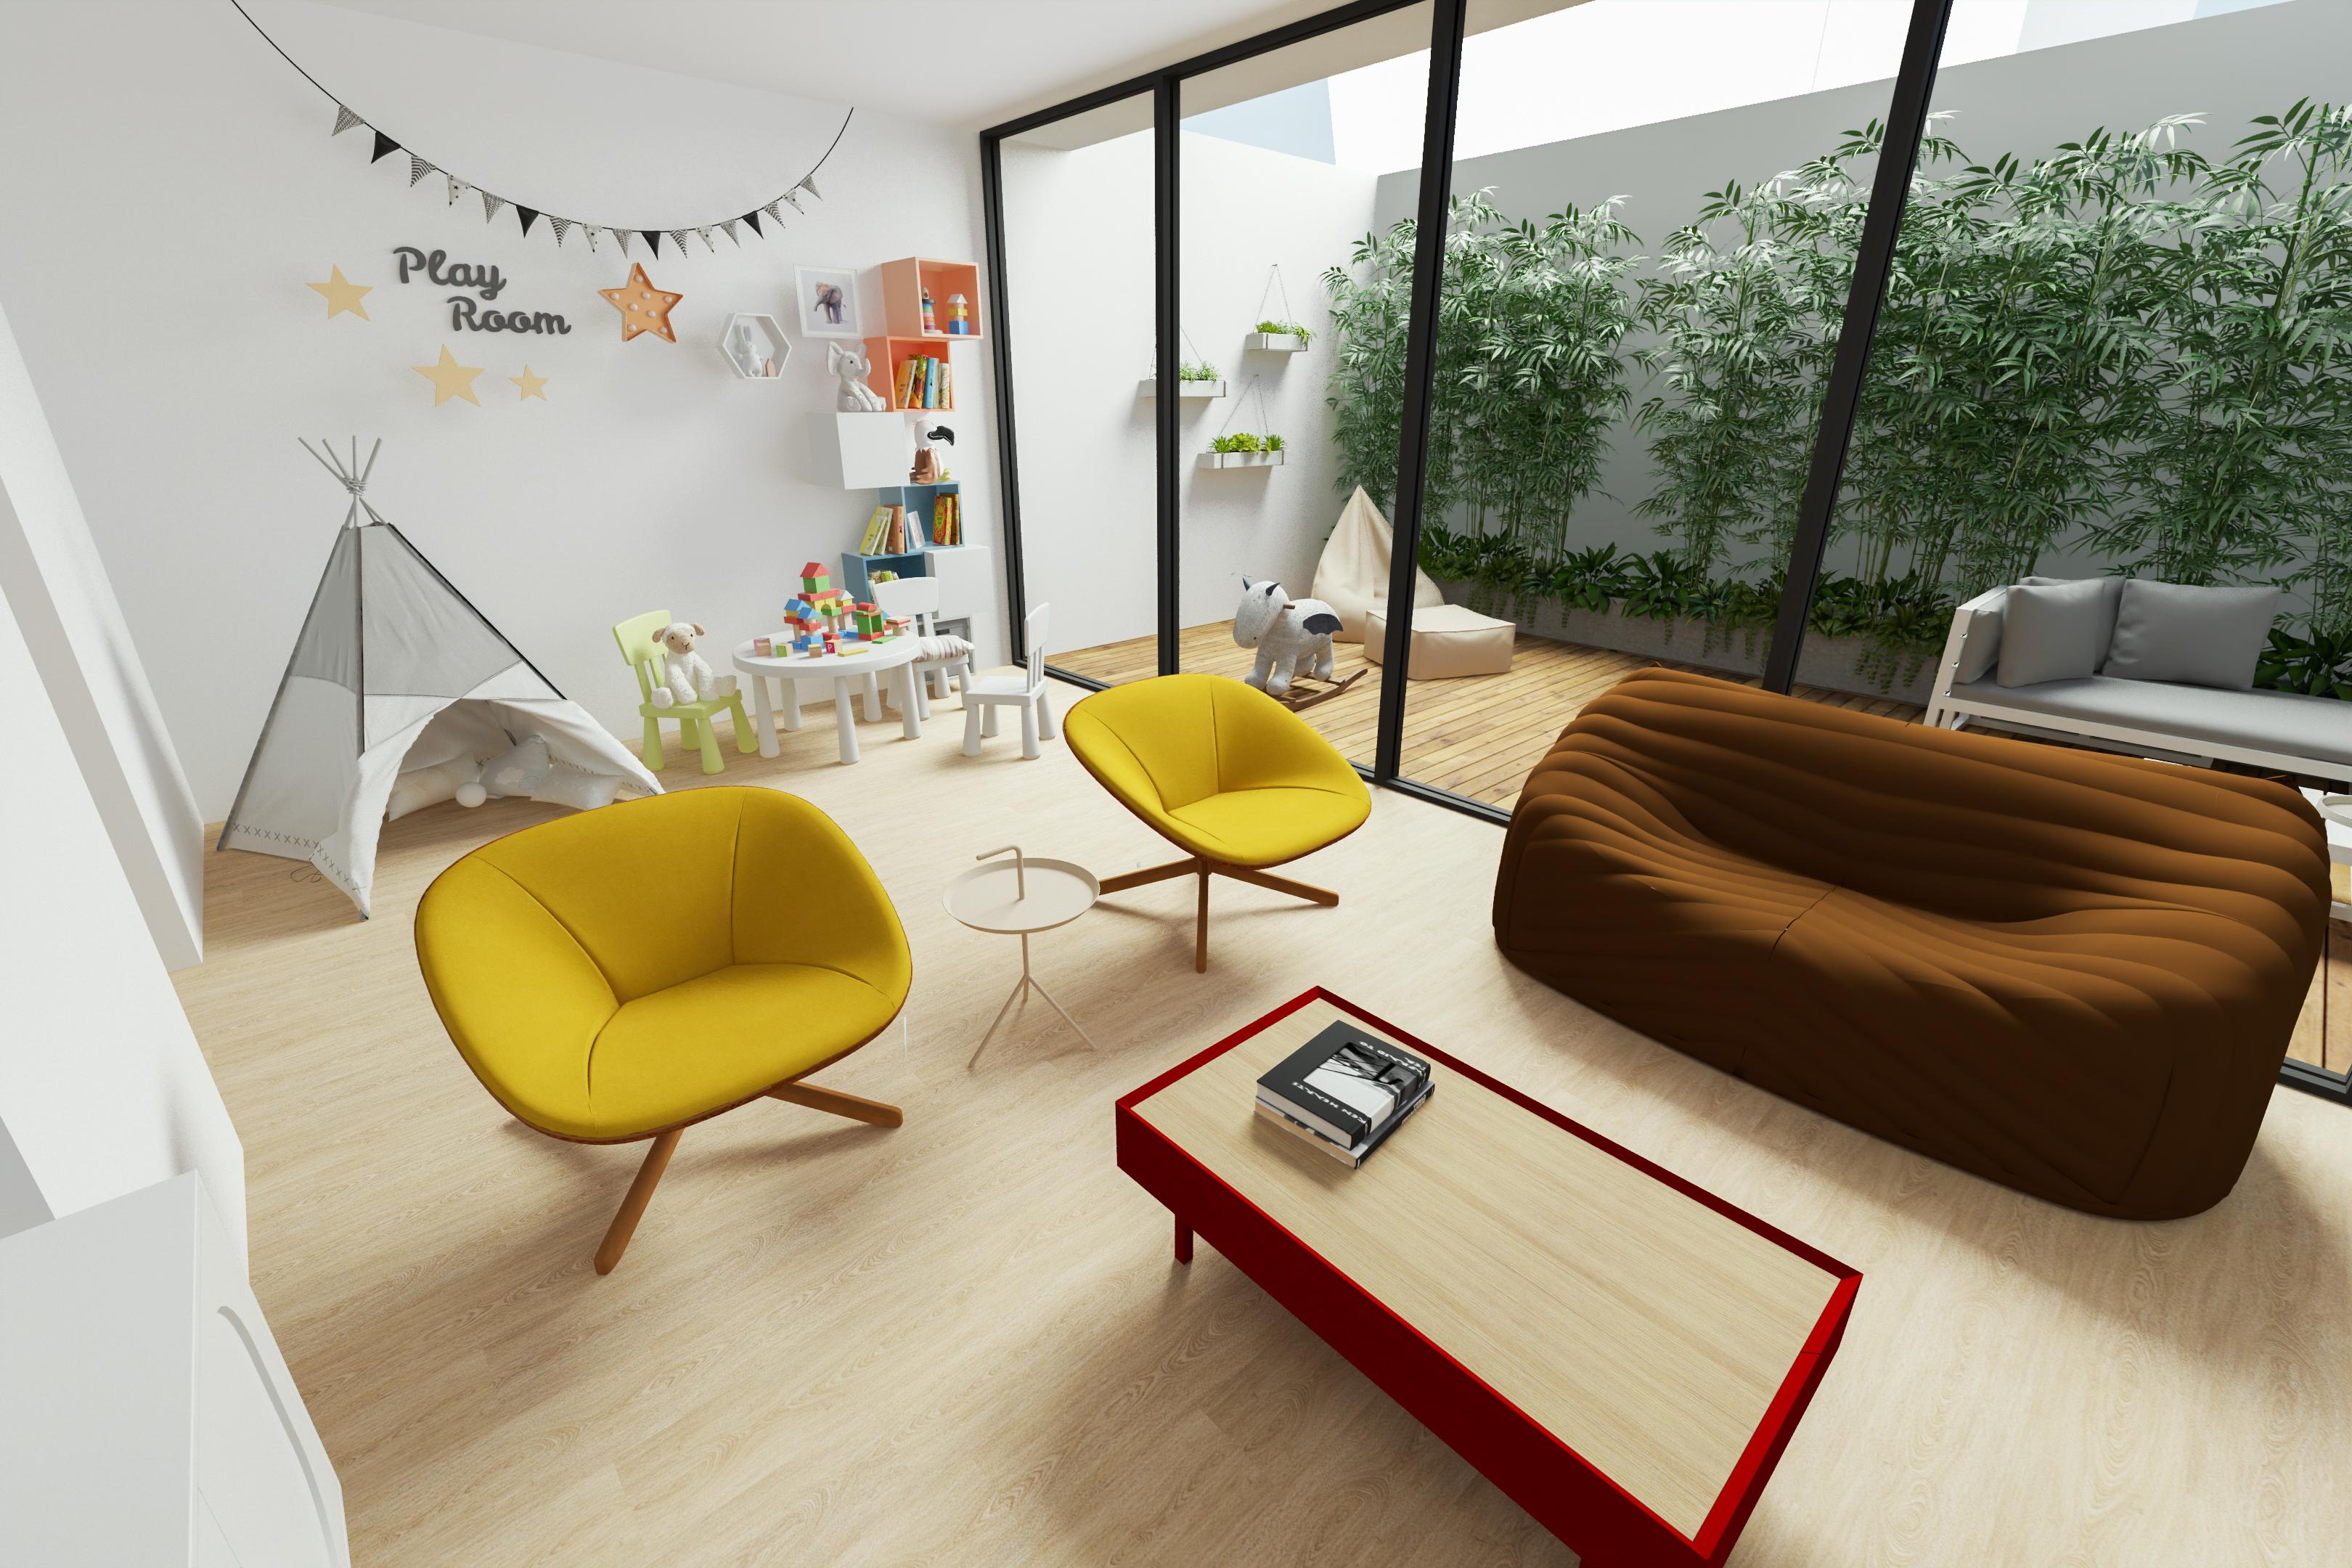 Dormitorio principal, Veta by Baraka